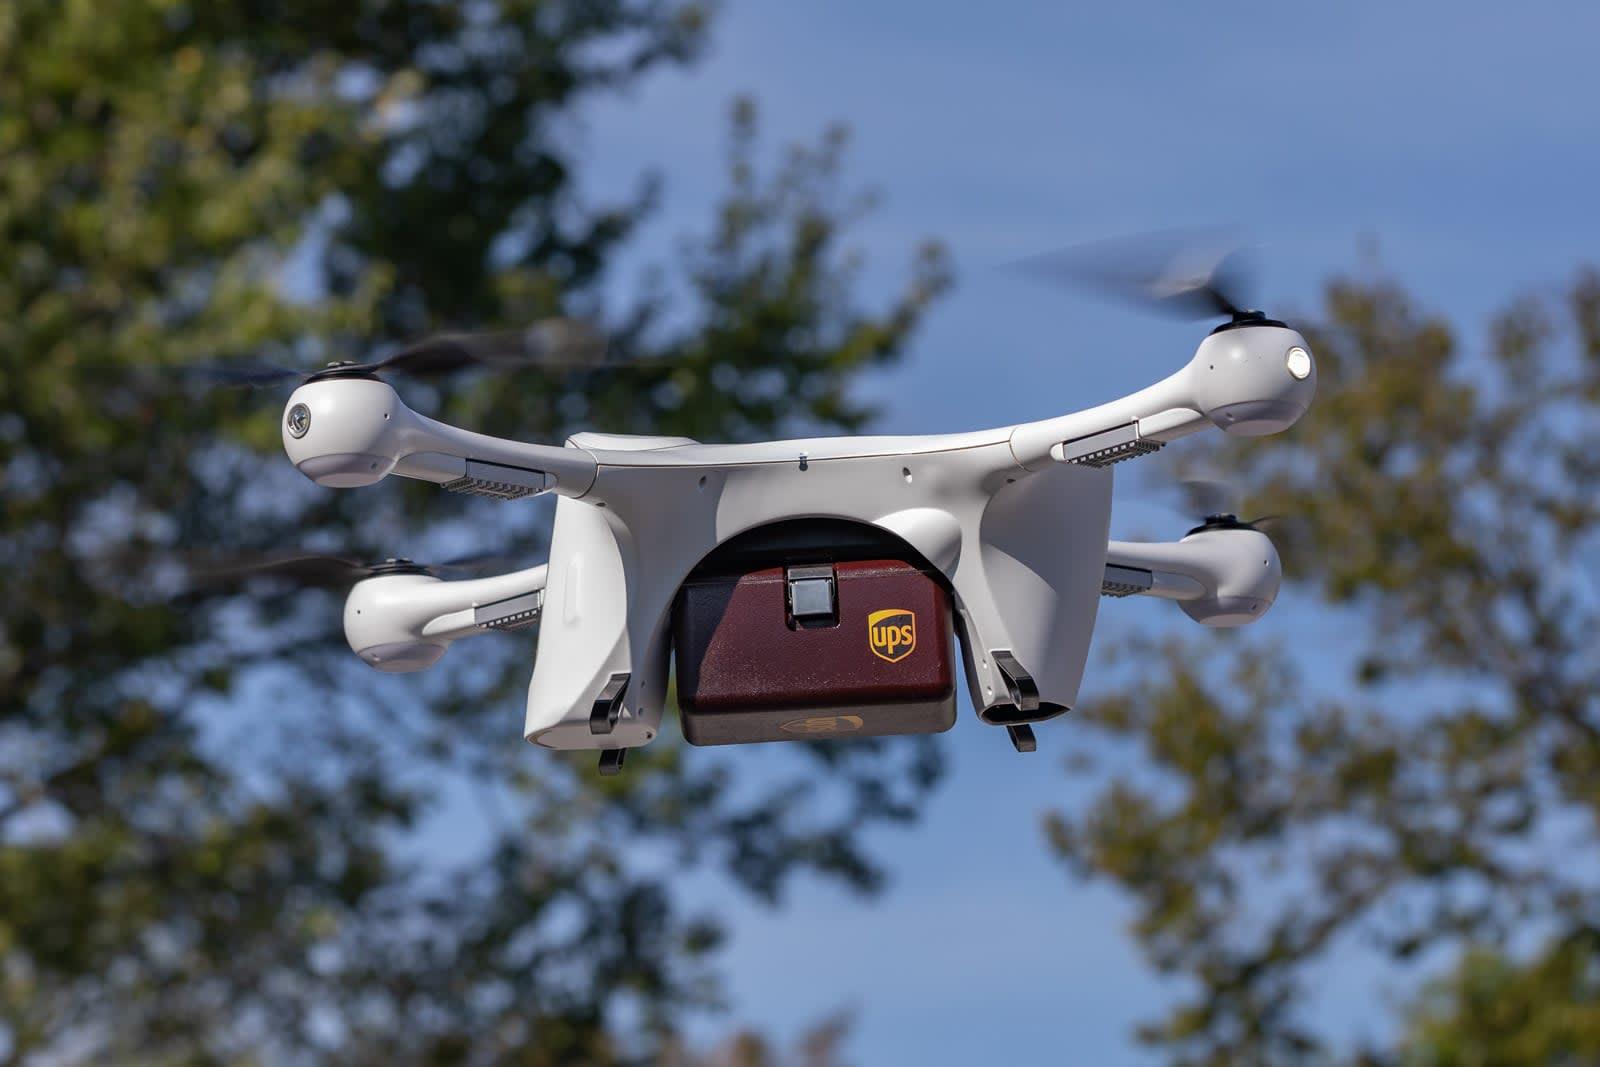 UPS and CVS plan to deliver prescriptions via drone